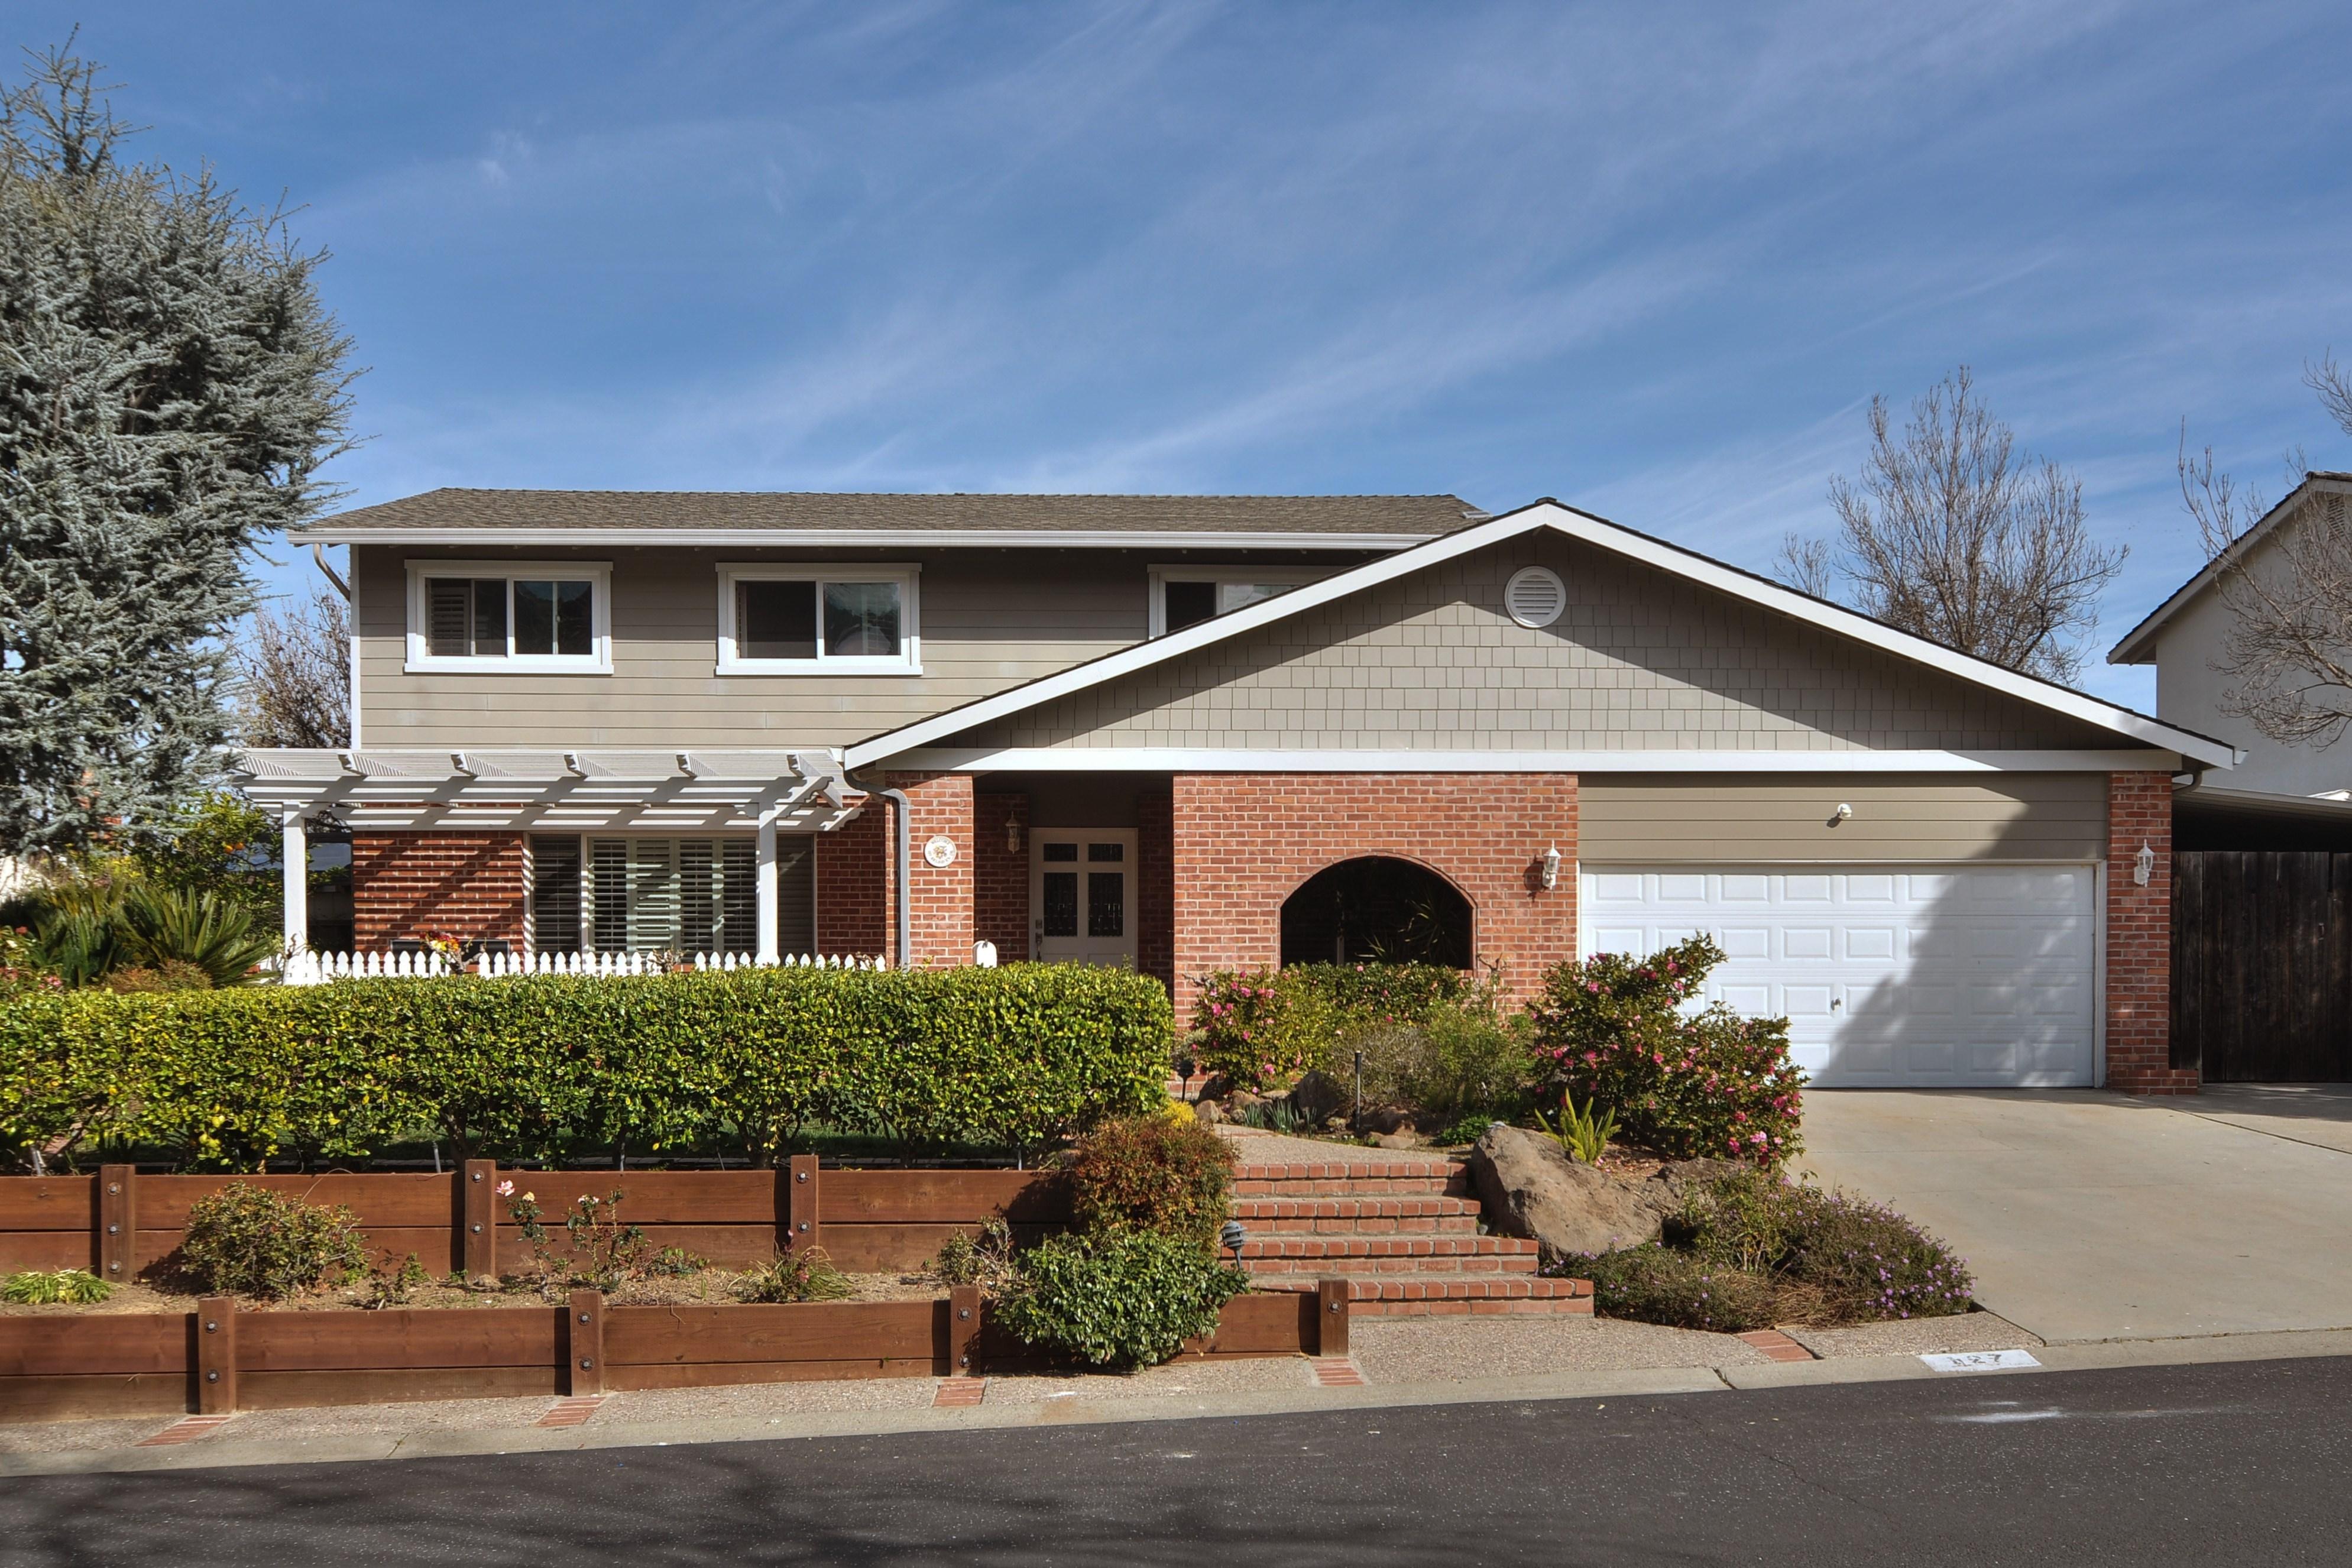 001 127 Belhaven Drive - Exquisite, expansive, remodeled Belwood home - 127 Belhaven Drive, Los Gatos